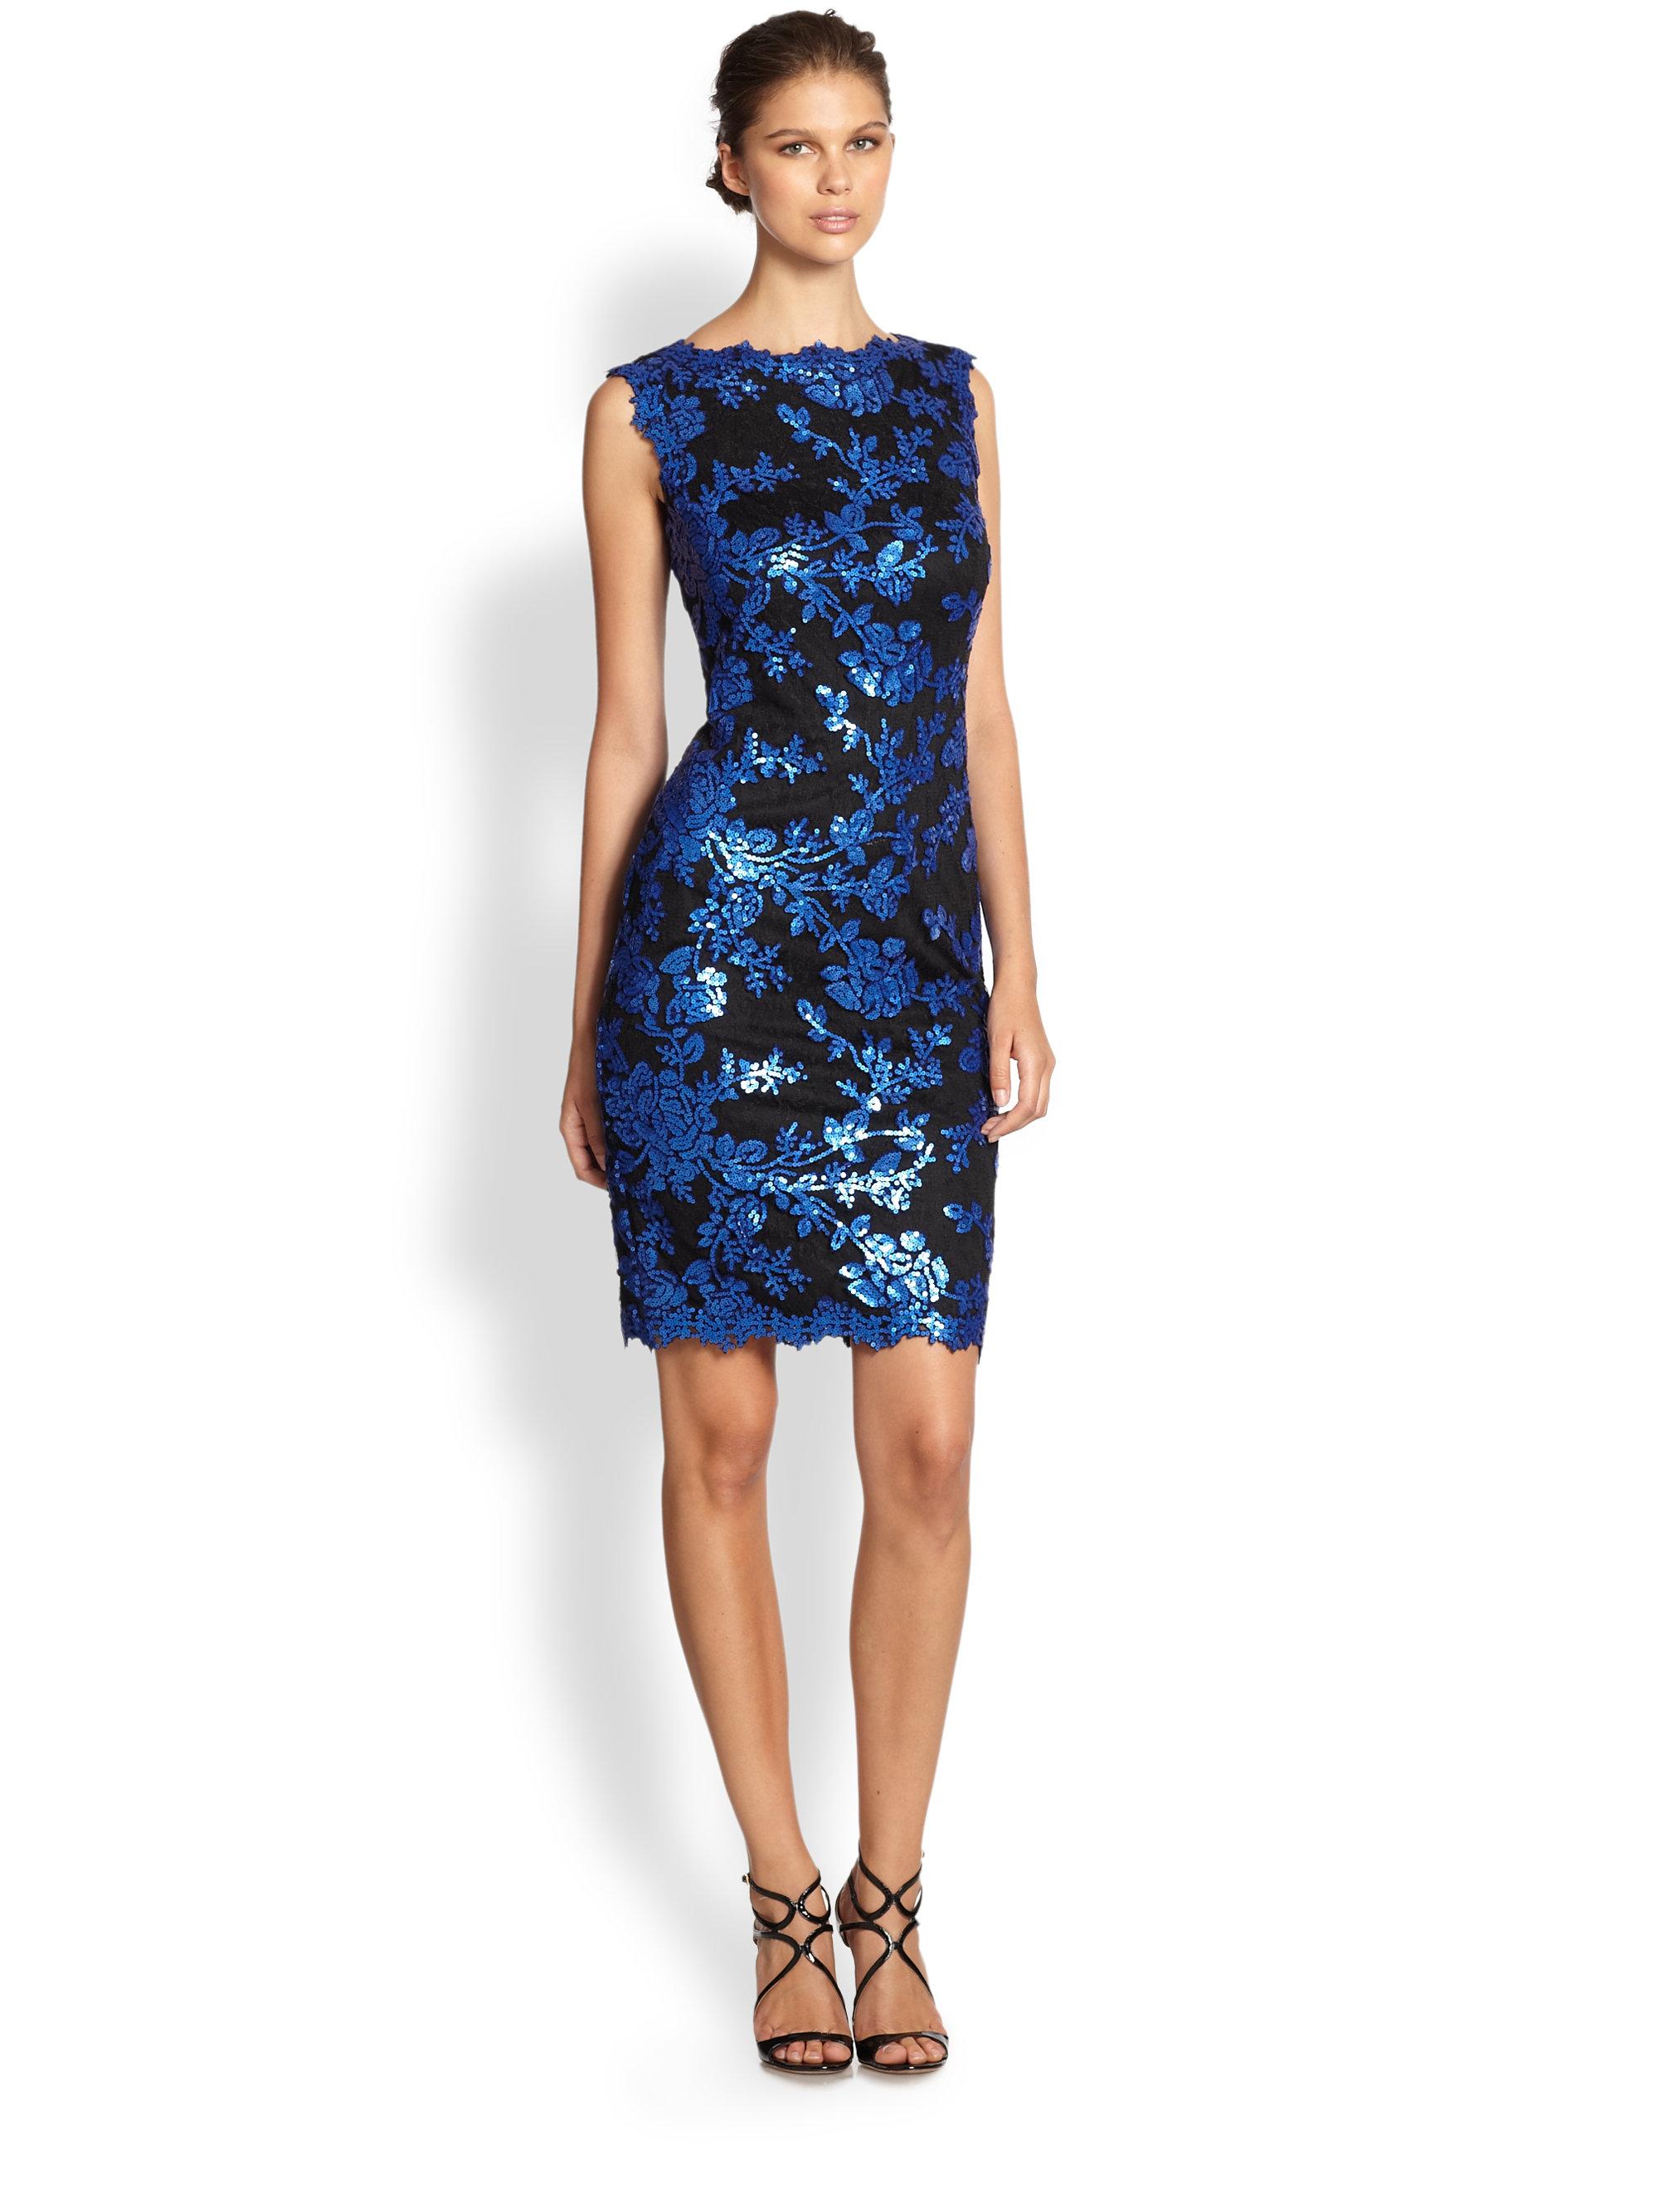 Tadashi shoji Sleeveless Sequin Dress in Blue - Lyst